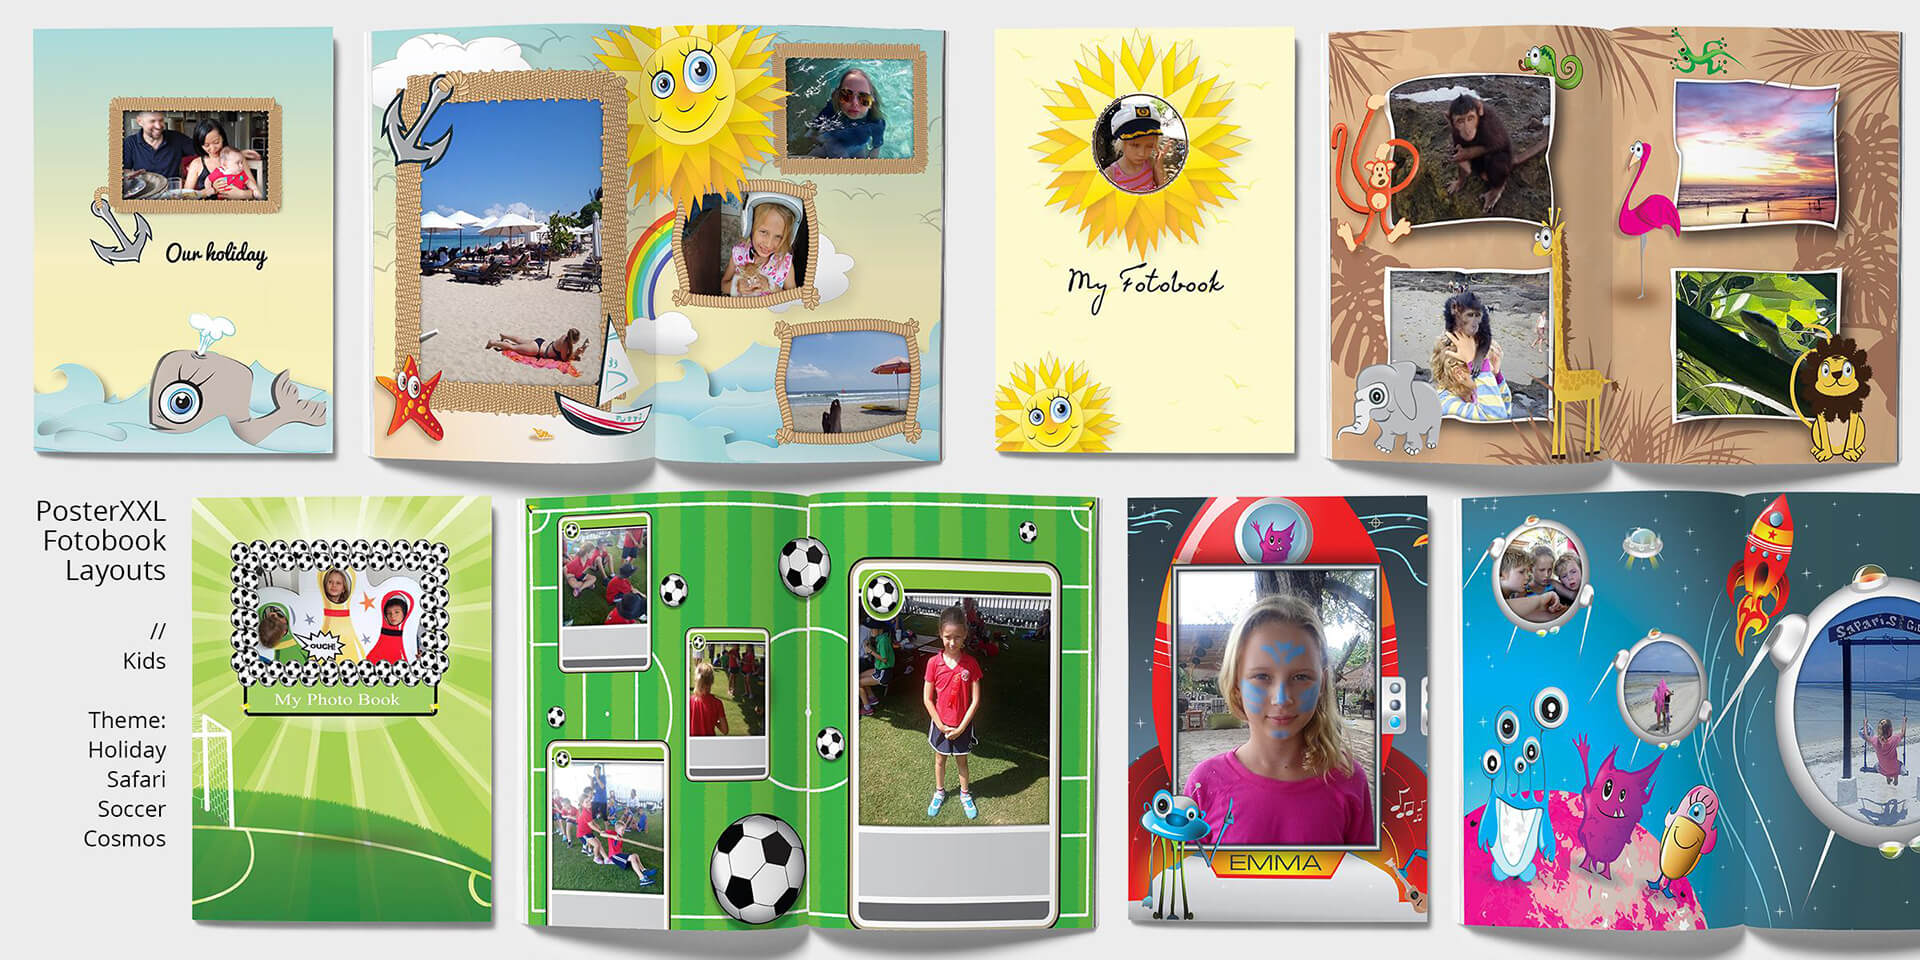 web to print web2print online print agency webtoprint fotobook variable graphics walltattoo popart calendar smartphone case greeting card 5 4